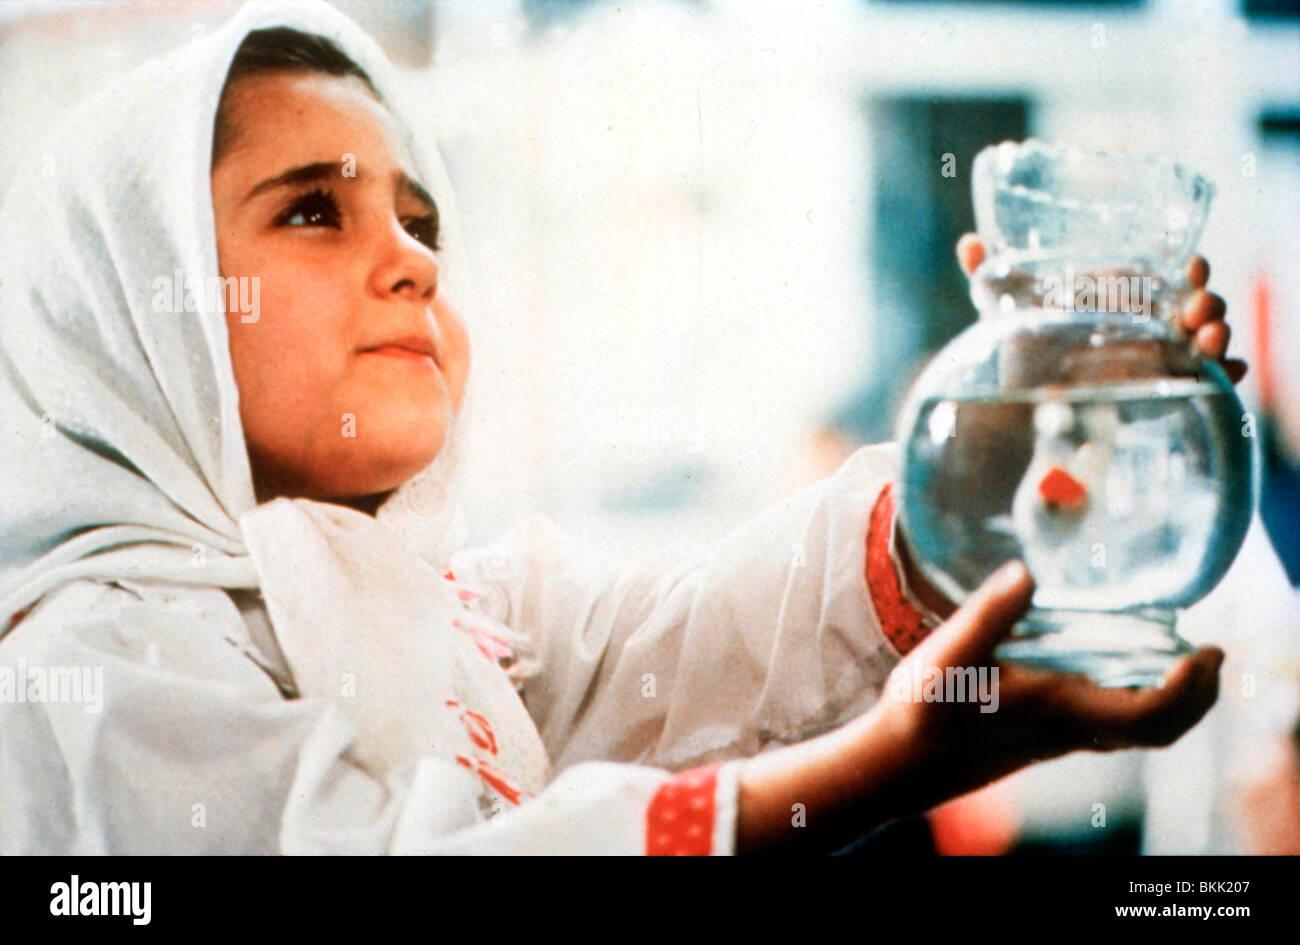 THE WHITE BALLOON (1995) BADKONAKE SEFID (ALT) AIDA MOHAMMADKHANI TWBN 002 Stock Photo